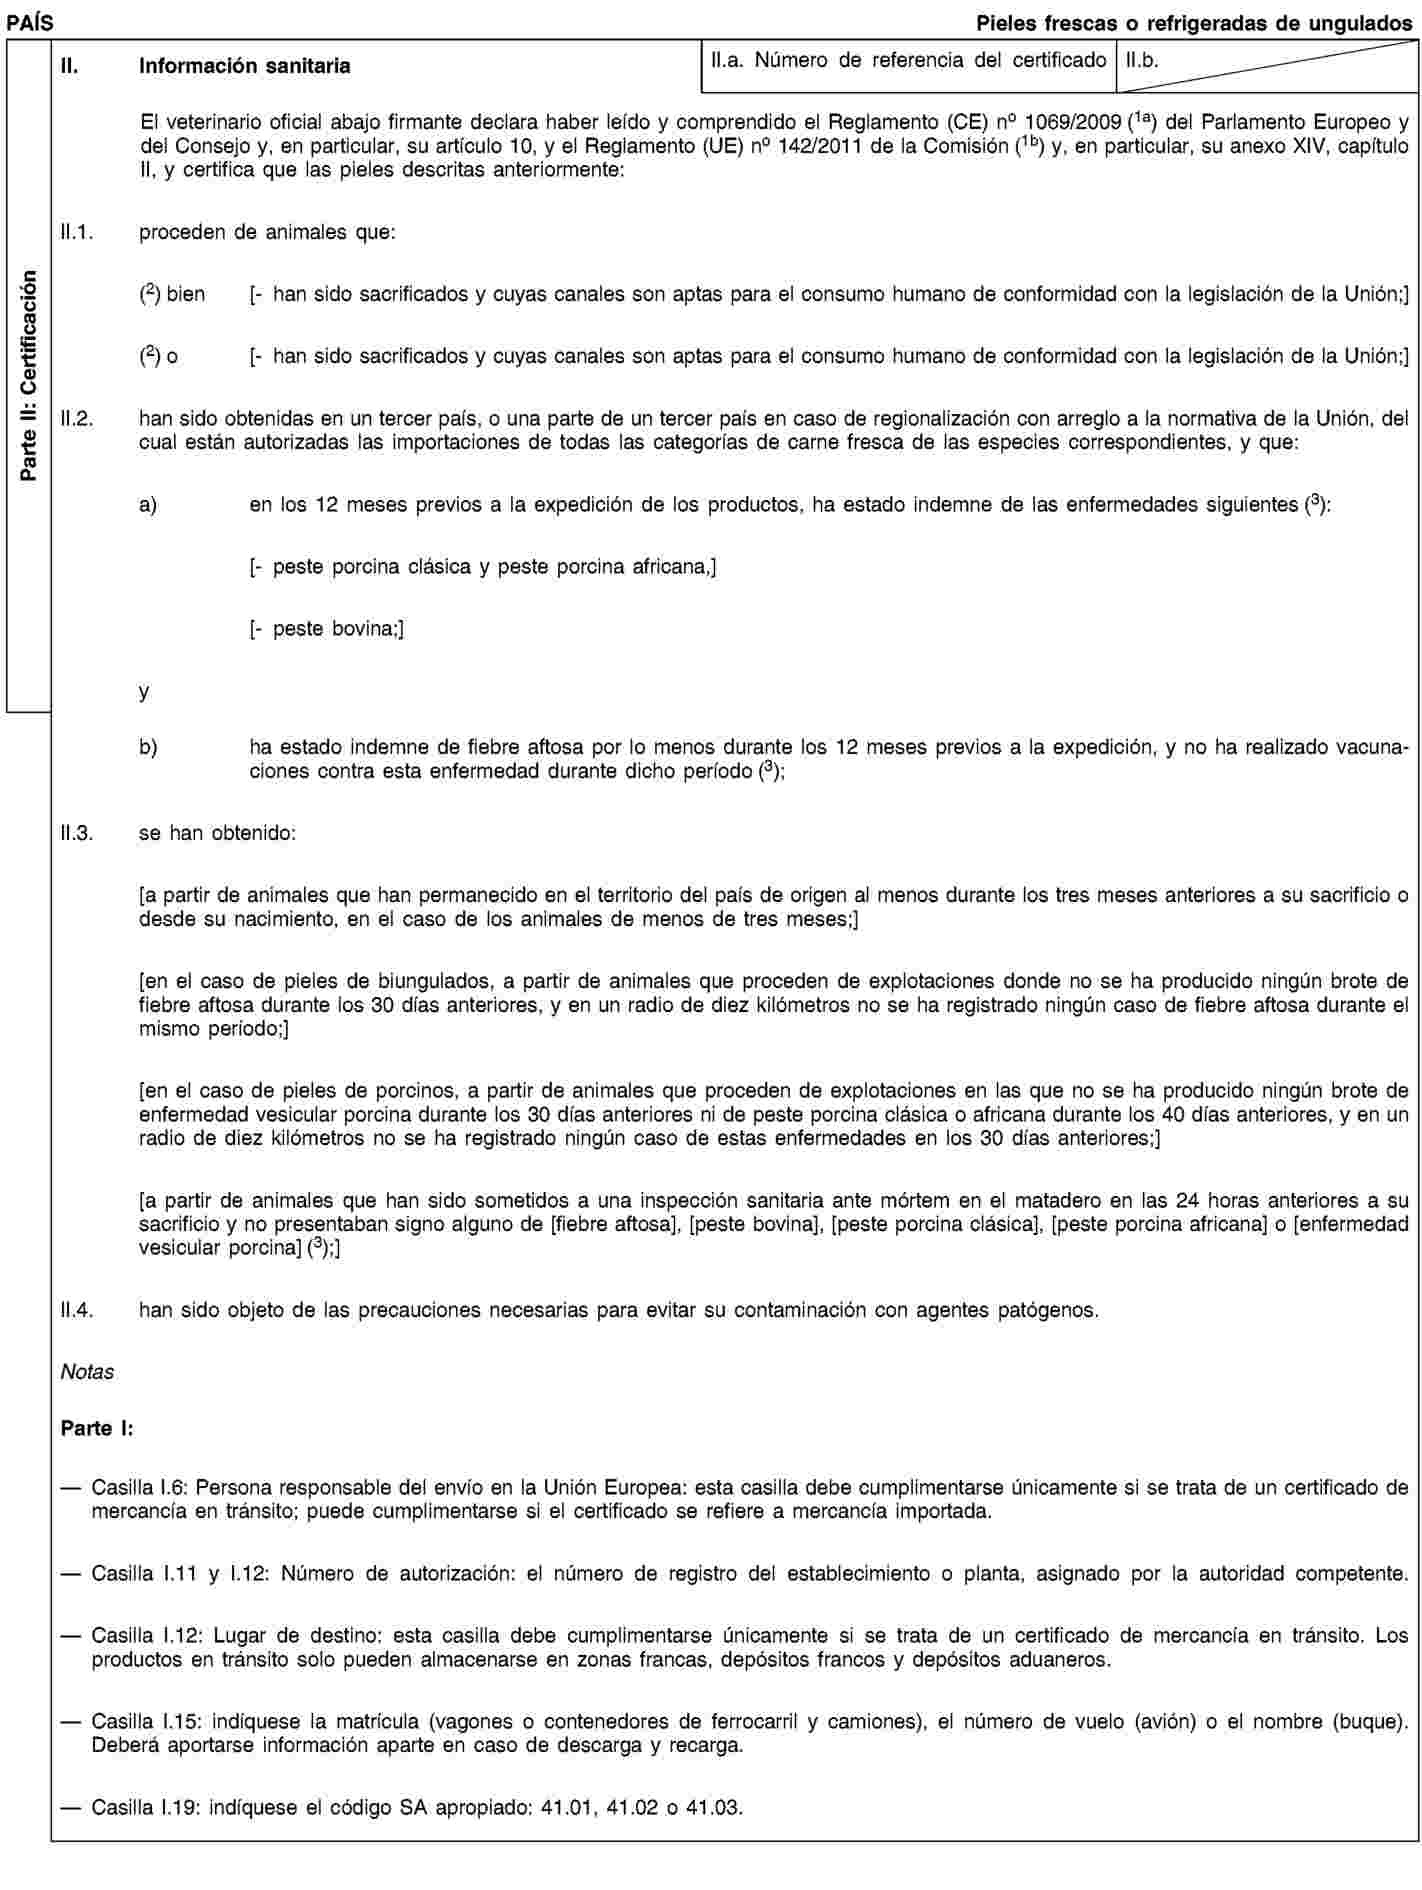 Imagen: https://eur-lex.europa.eu/resource.html?uri=uriserv:OJ.L_.2011.054.01.0001.01.SPA.xhtml.L_2011054ES.01017701.tif.jpg